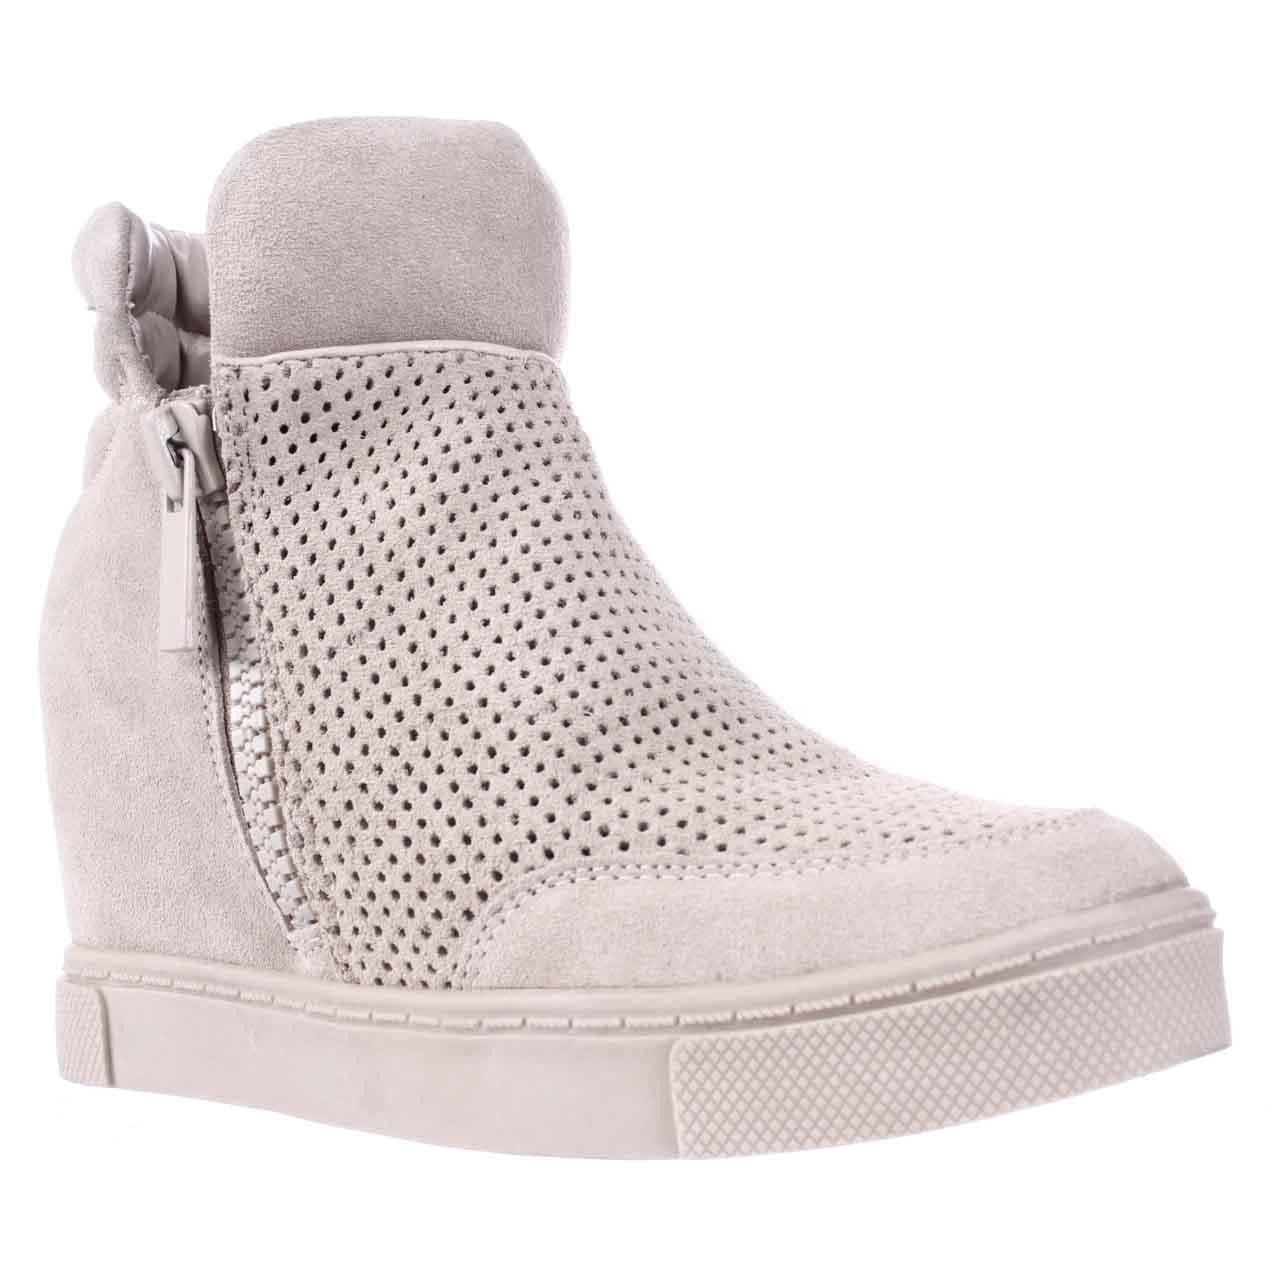 29e85e136e8 Steve Madden Linqsp Perforated Wedge Fashion Sneakers - Sand